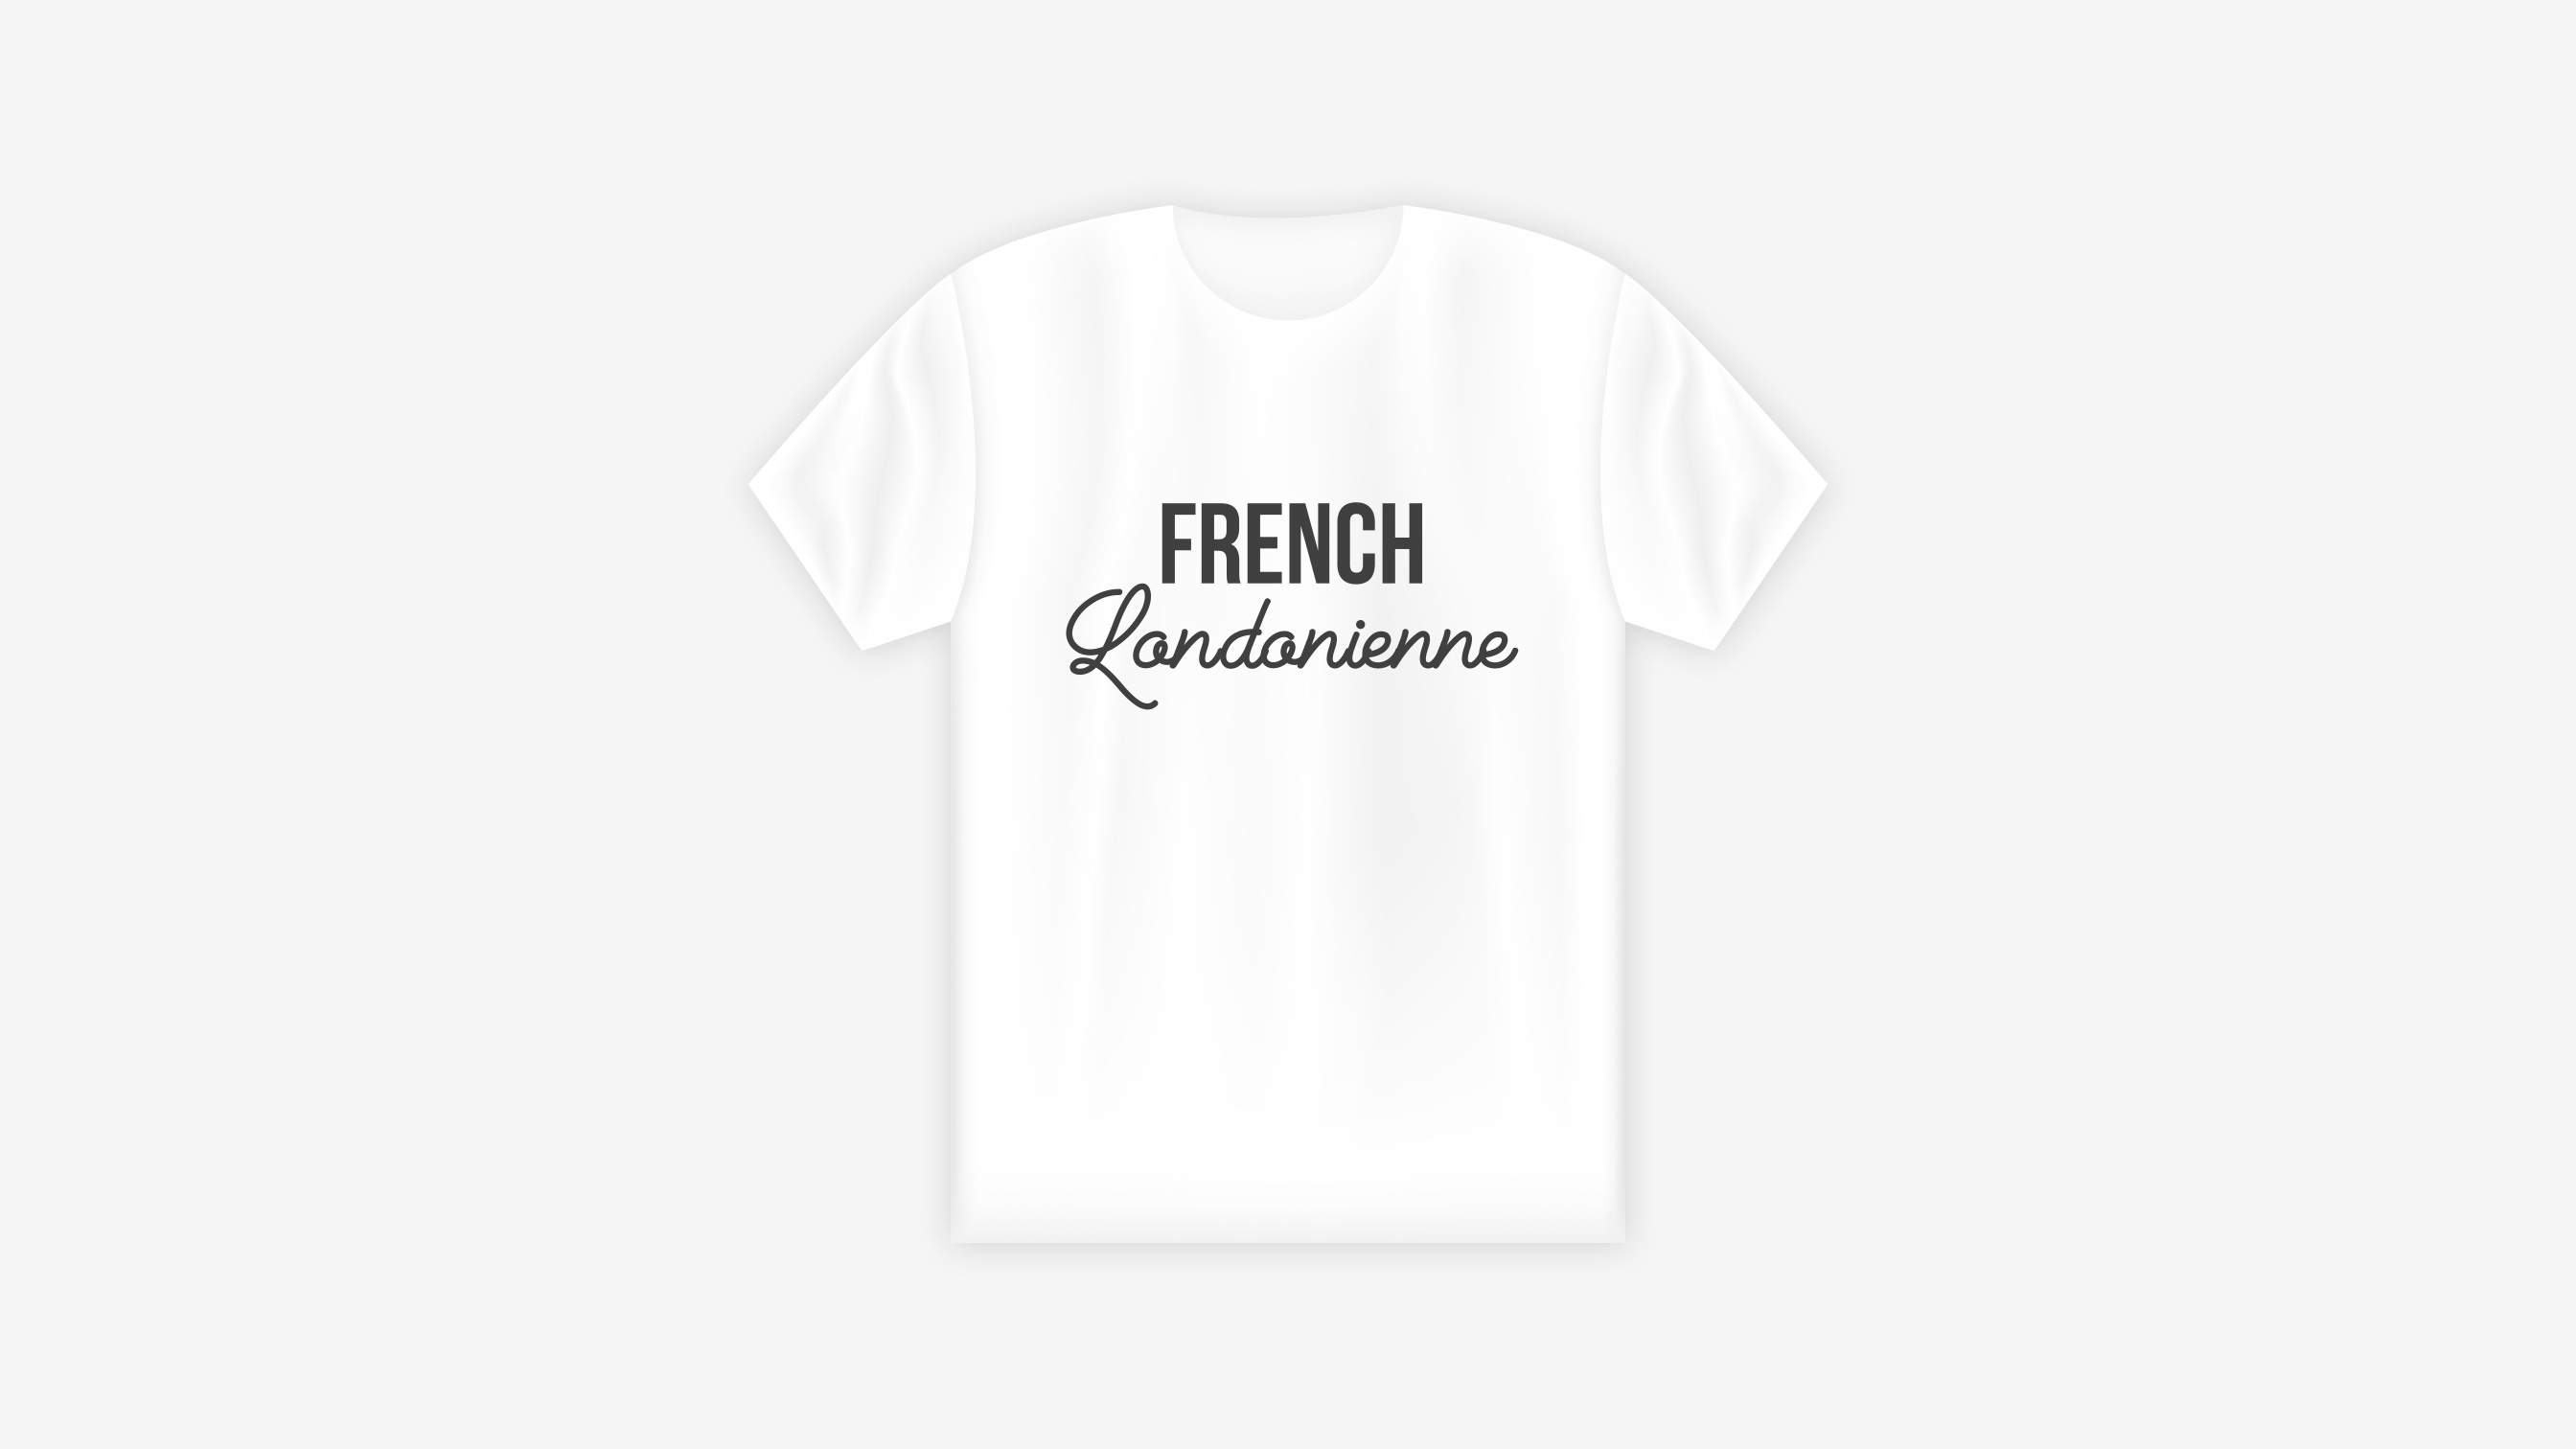 02-french-londonienne-pikteo-webdesign-graphic-design-freelance-paris-bruxelles-londres